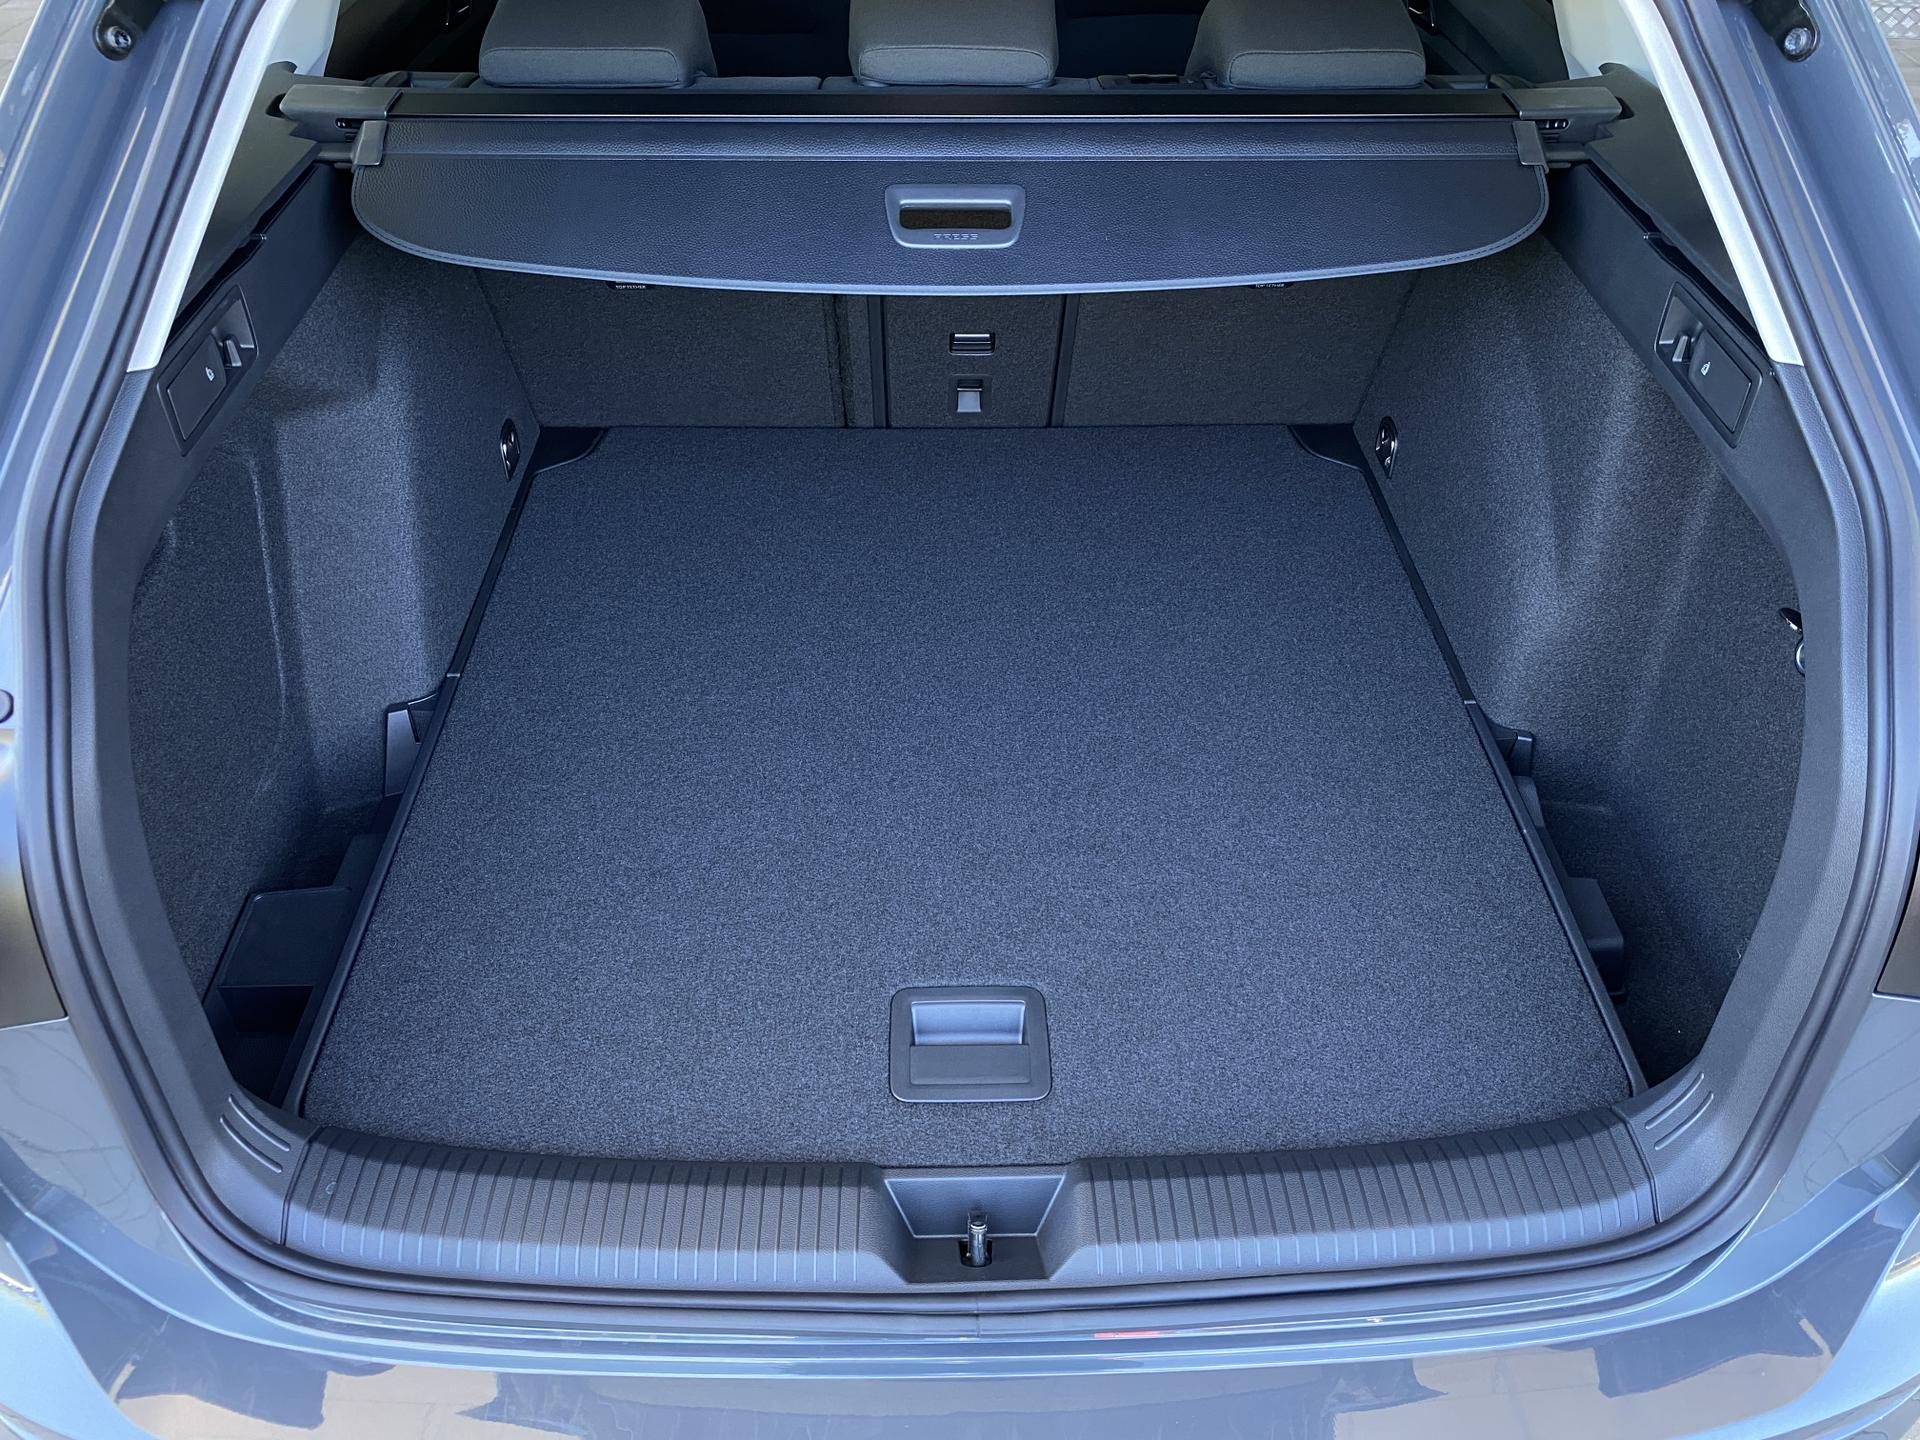 VW Golf Variant Kofferraum